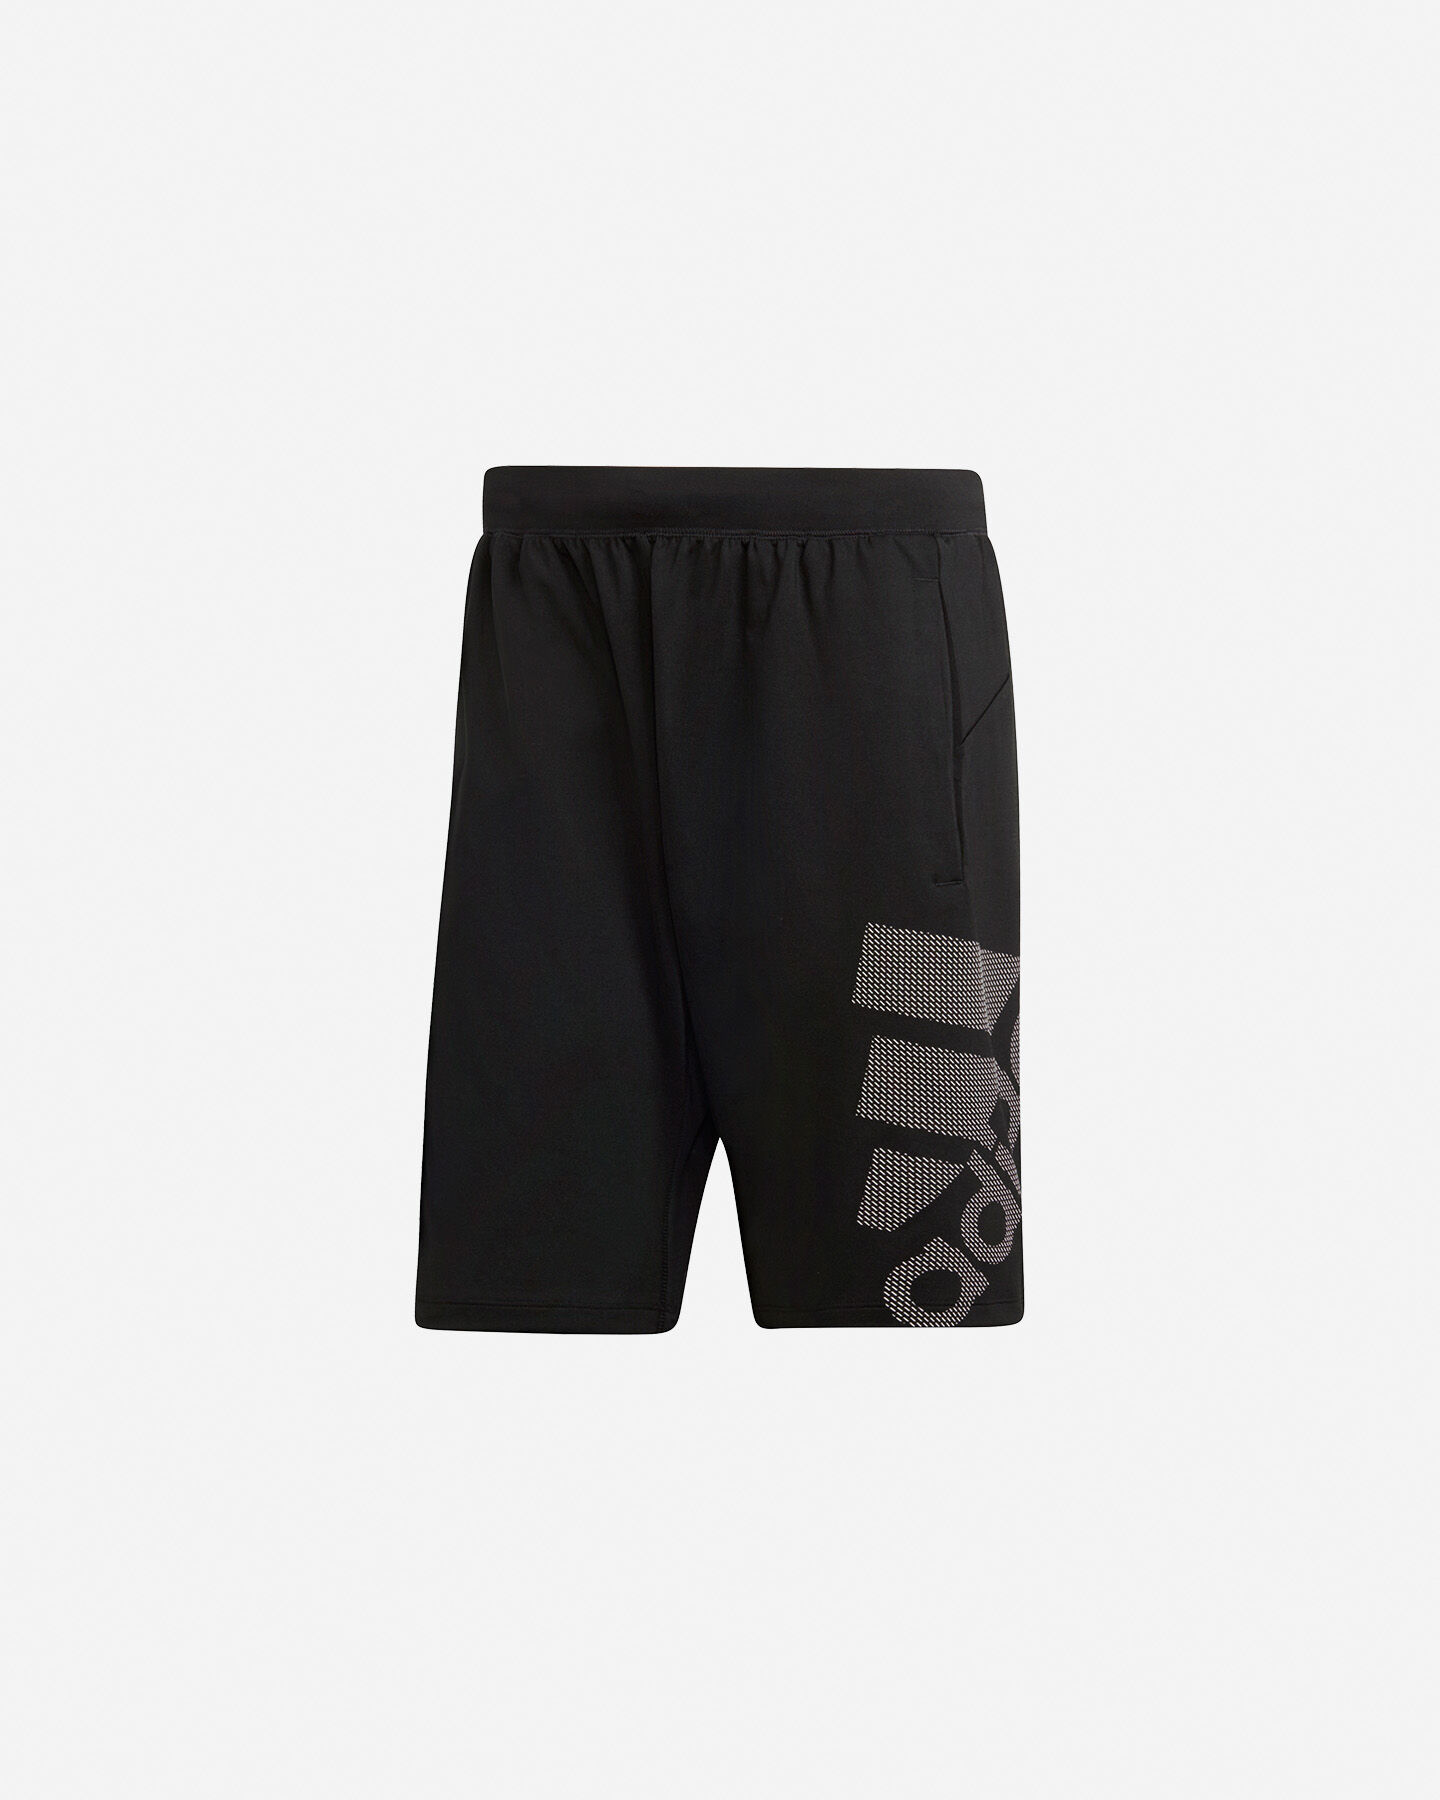 Pantalone training ADIDAS 4KRFT SPORT GRAPHIC BADGE OF SPORT M S2020483 scatto 0